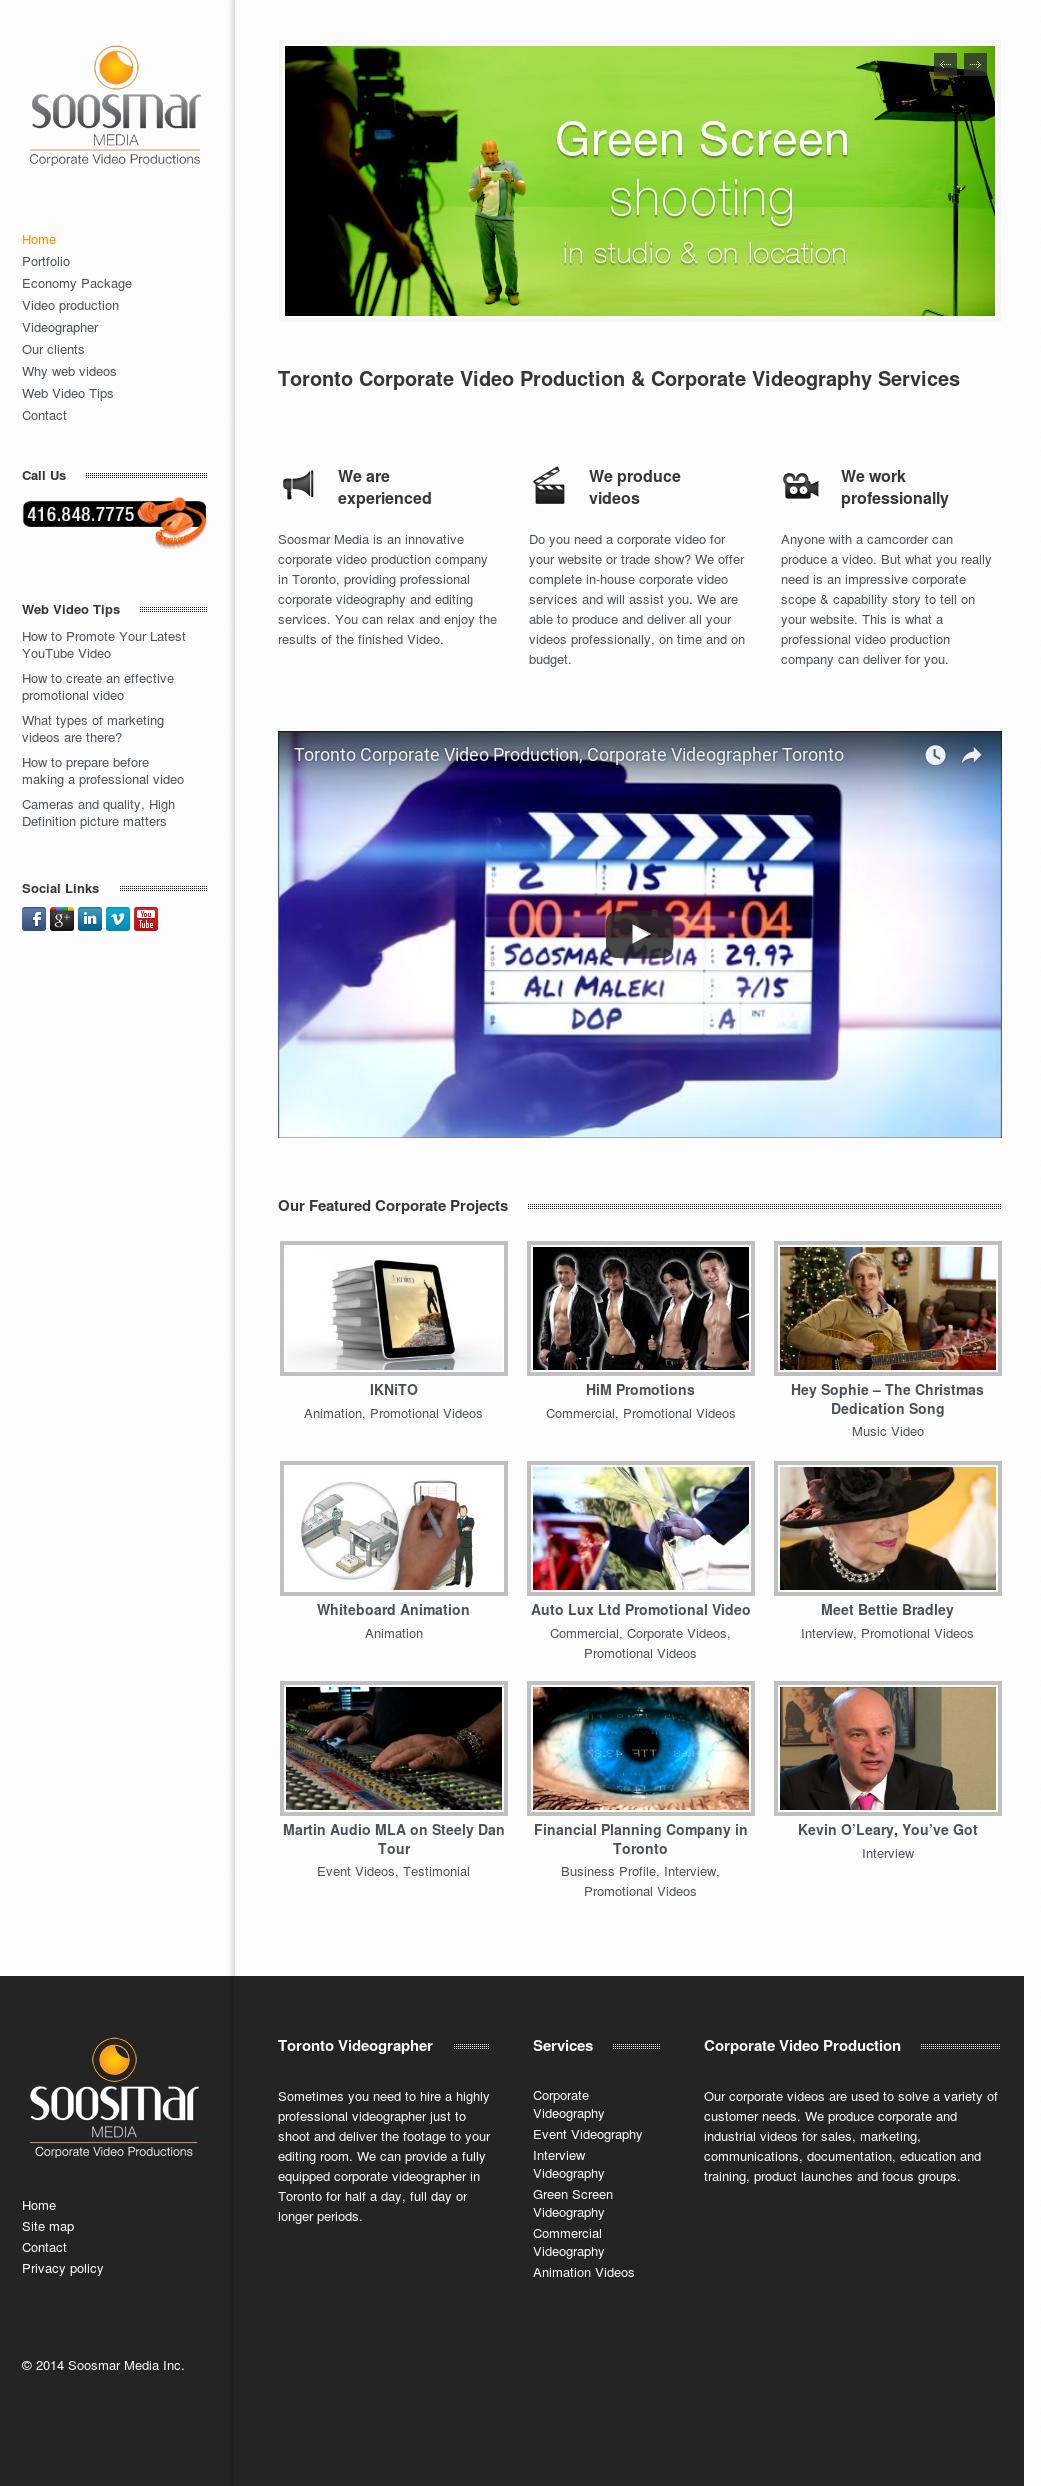 Soosmar Media Competitors, Revenue and Employees - Owler Company Profile